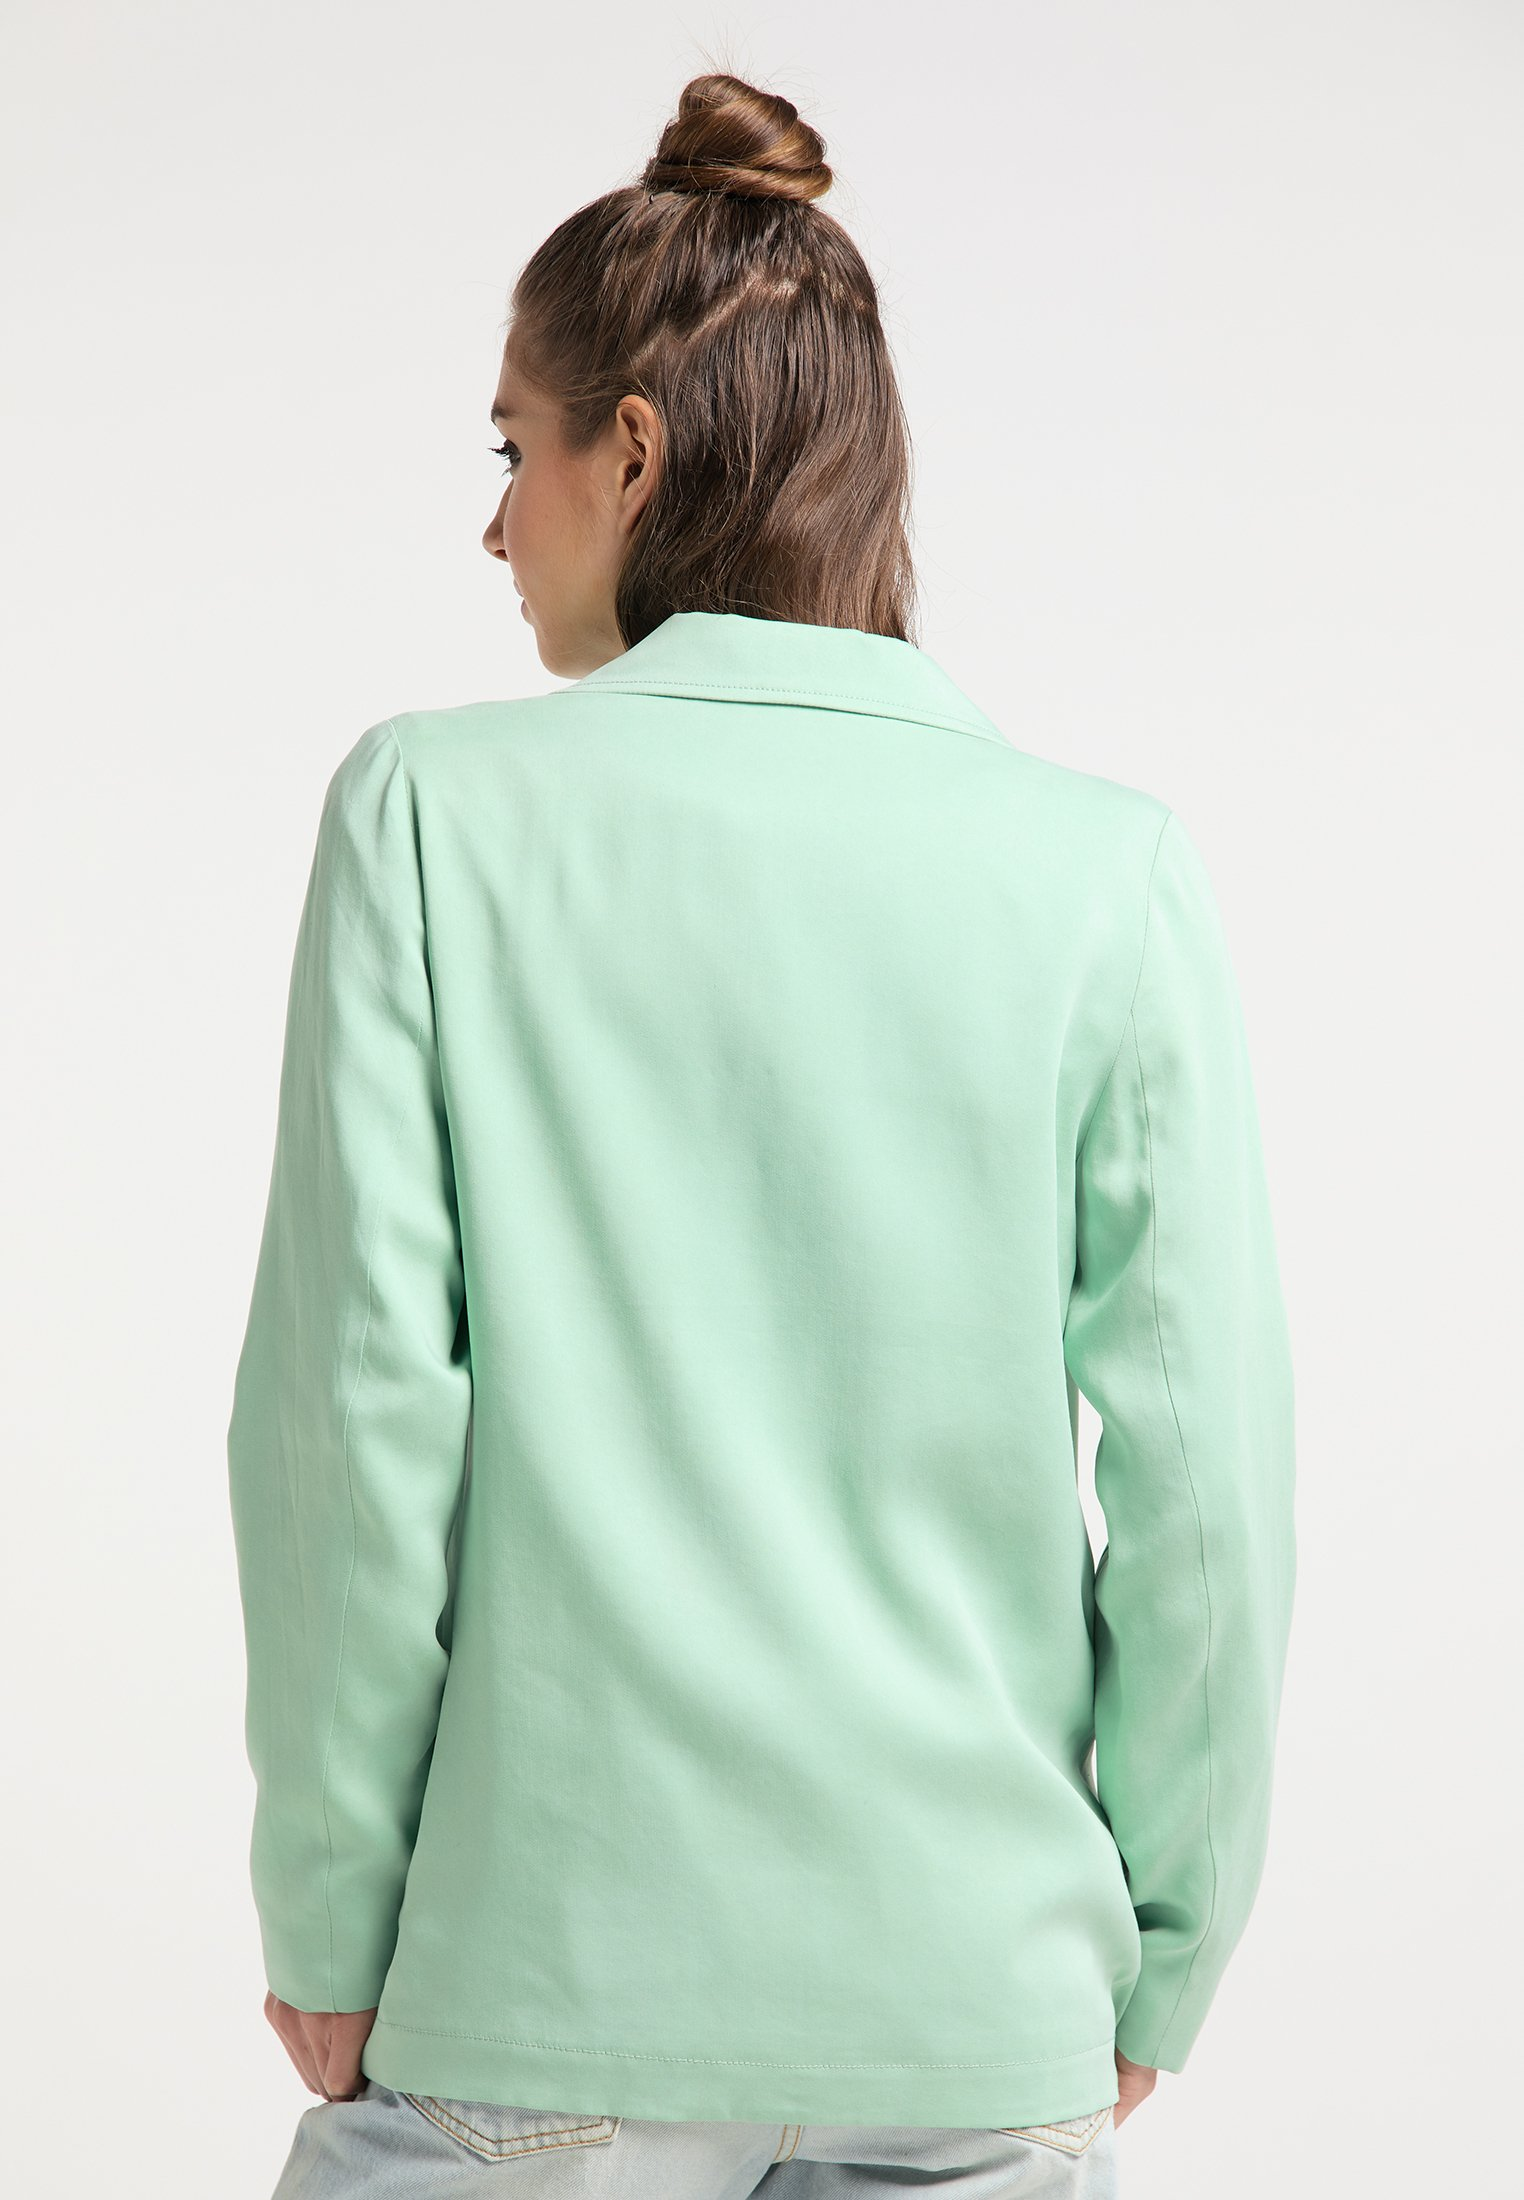 Drop Shipping Women's Clothing myMo Blazer neo mint lOXpO0rDL